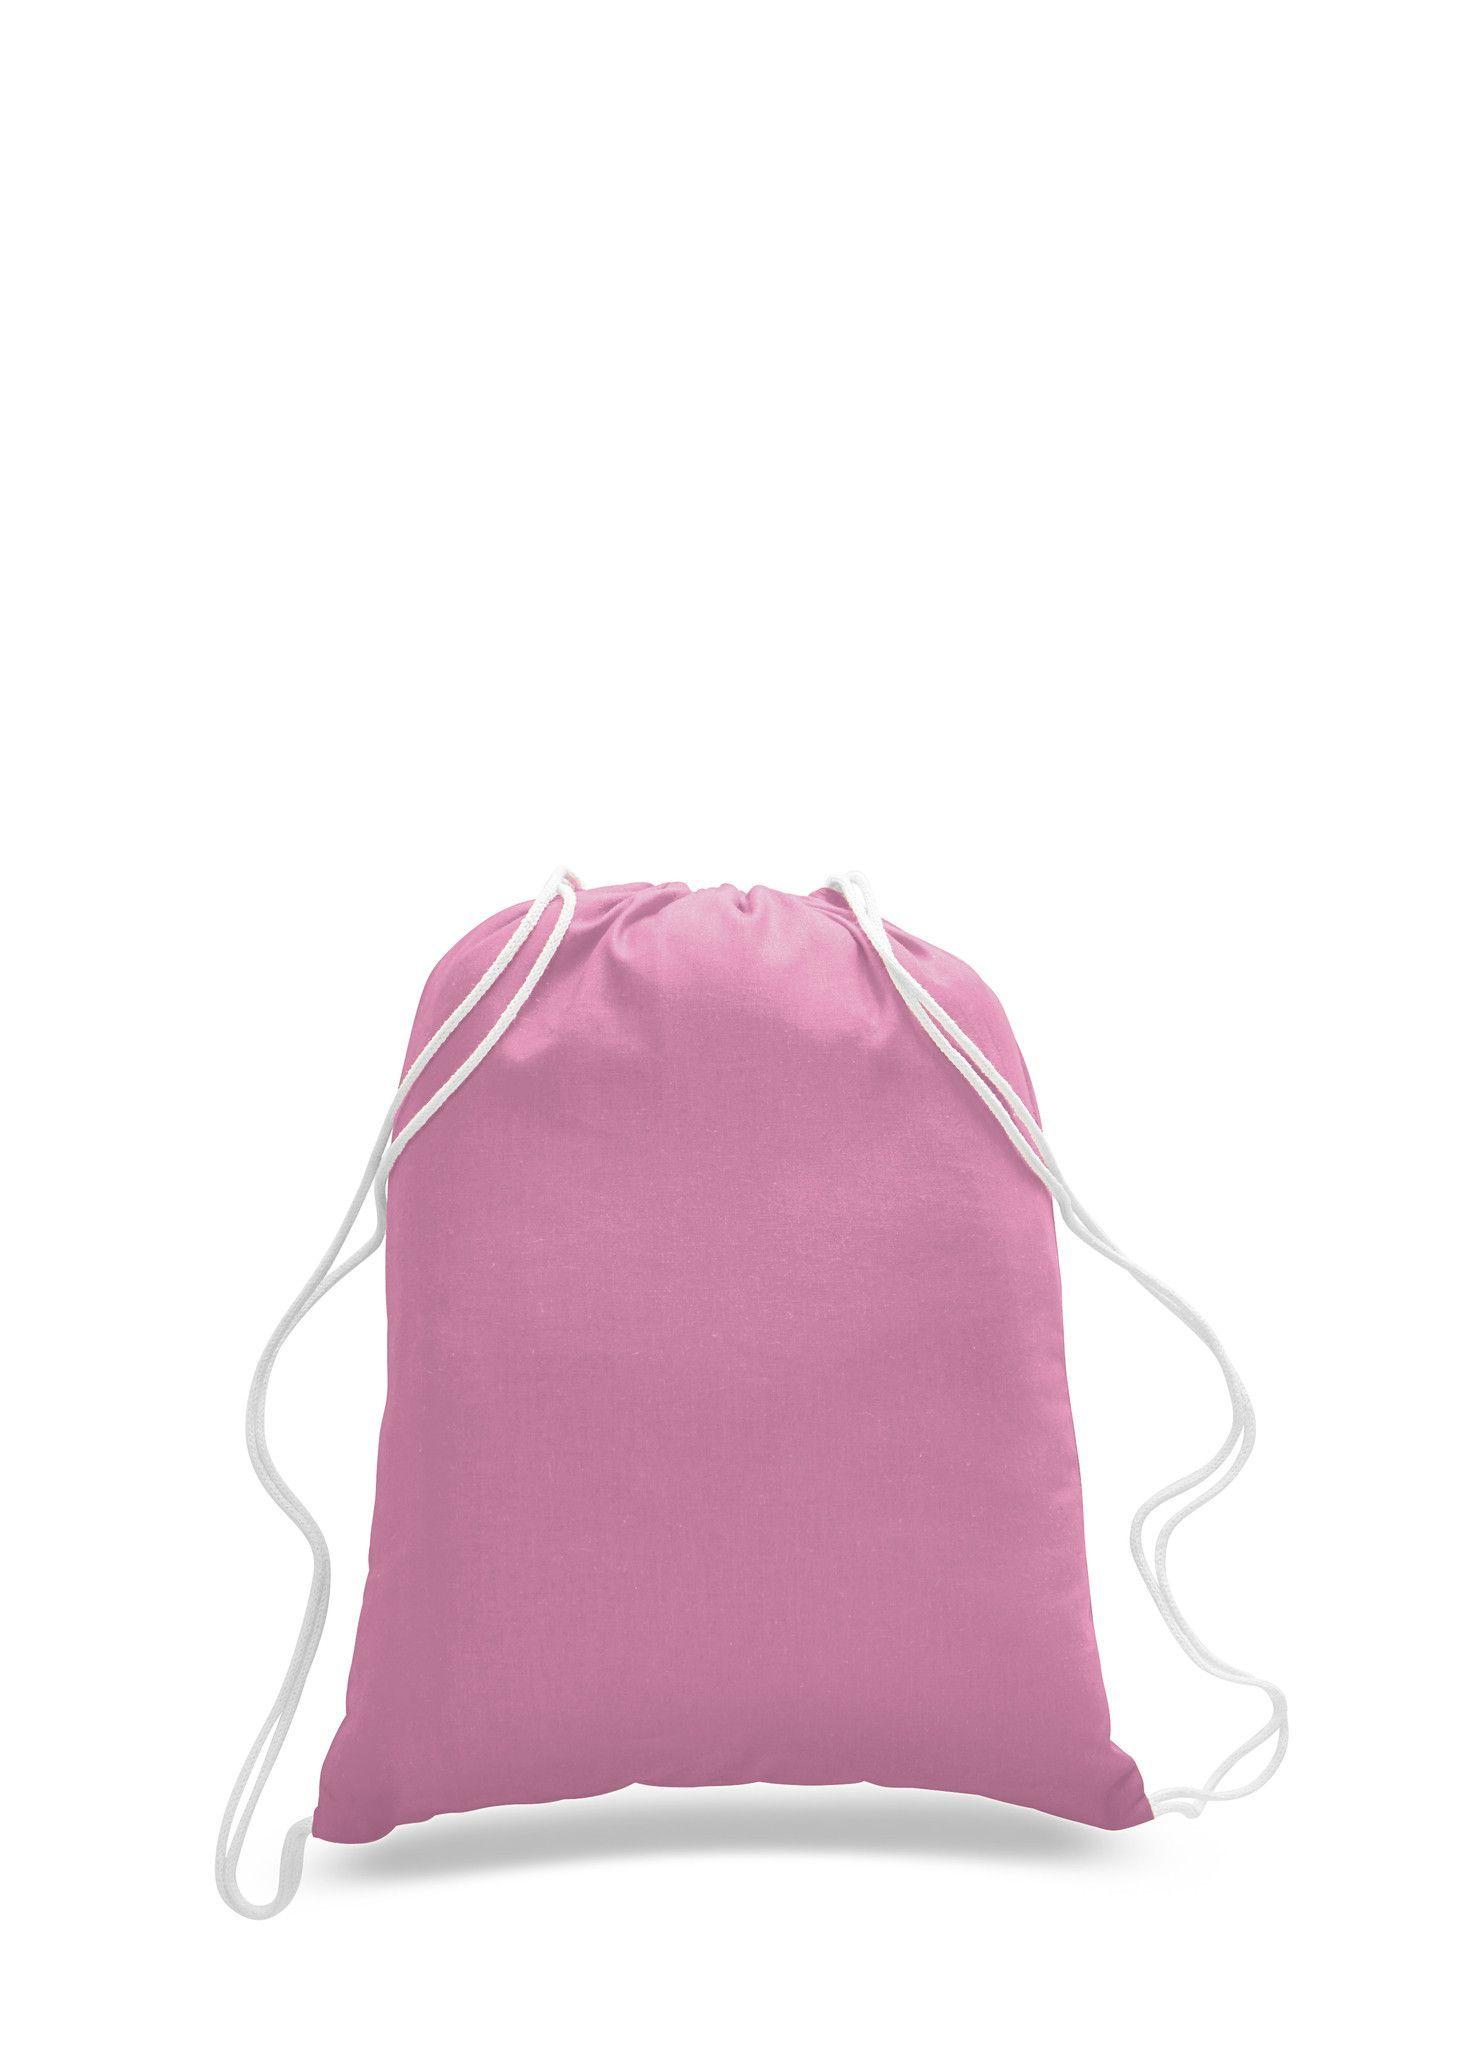 5fb6539c307 100% Cotton Budget Friendly Sport Promotional Drawstring Bag